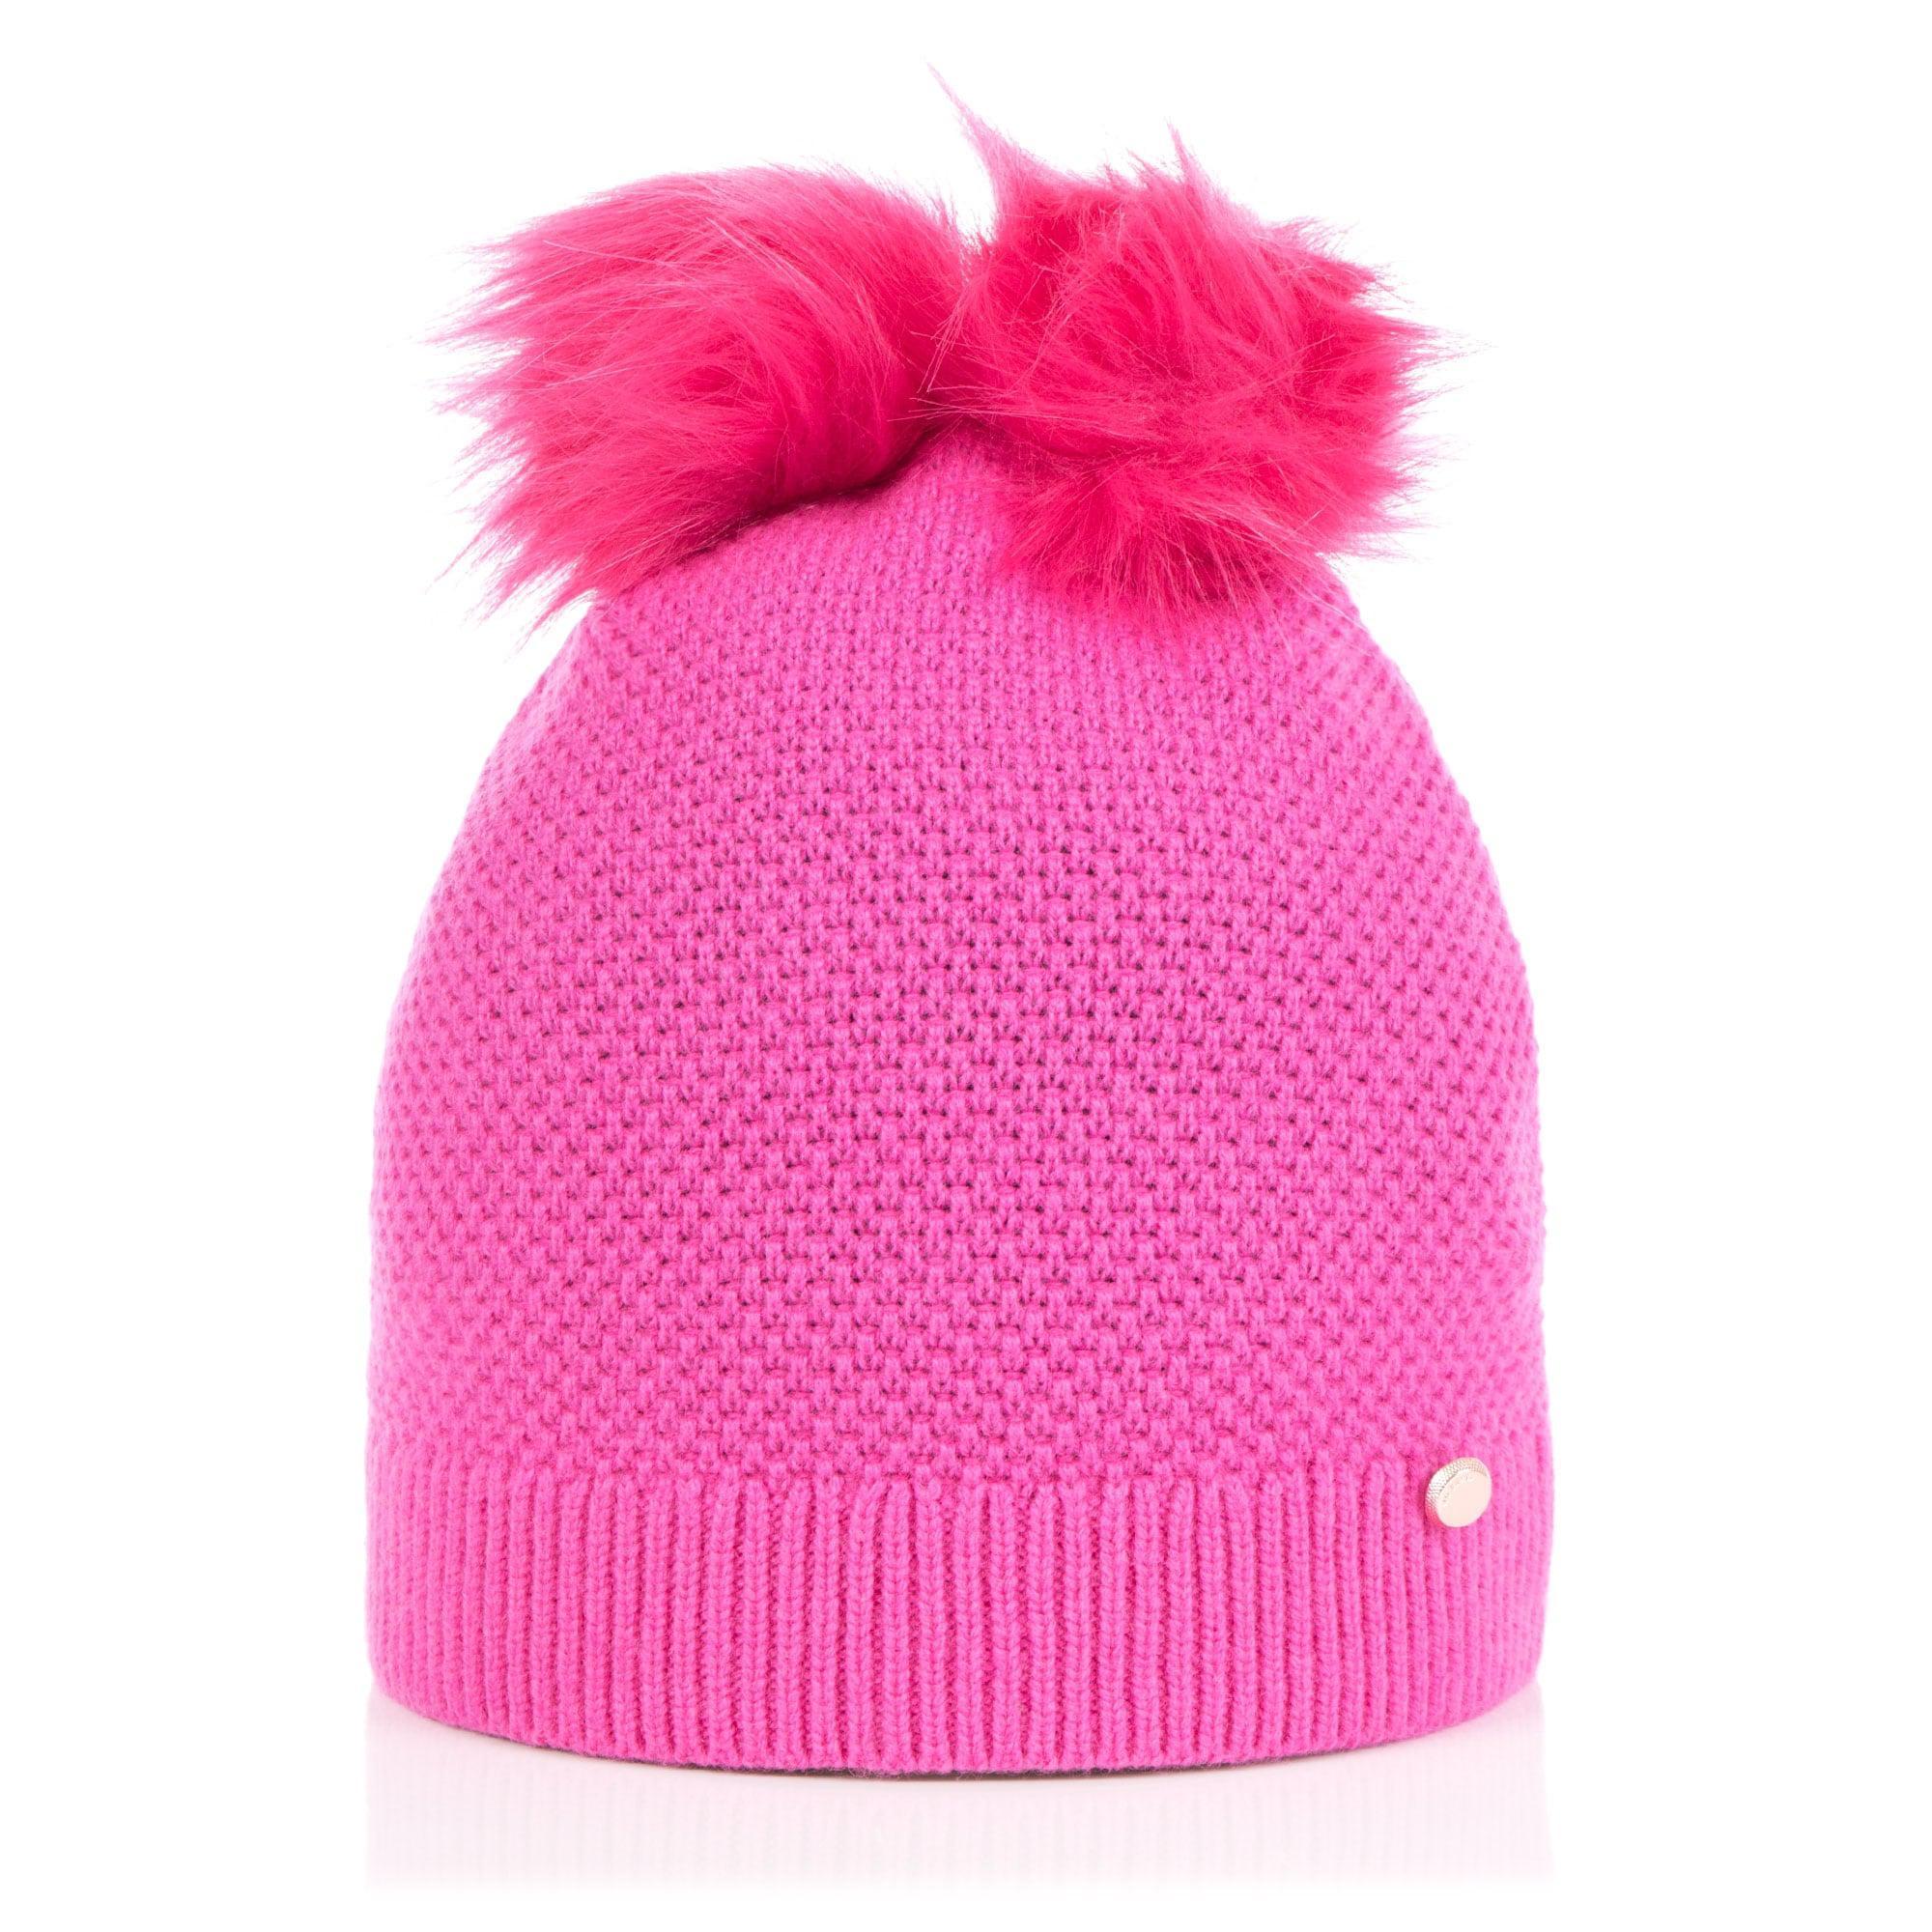 177bfb5466f Ted Baker Inita Pom Pom Hat in Pink - Lyst